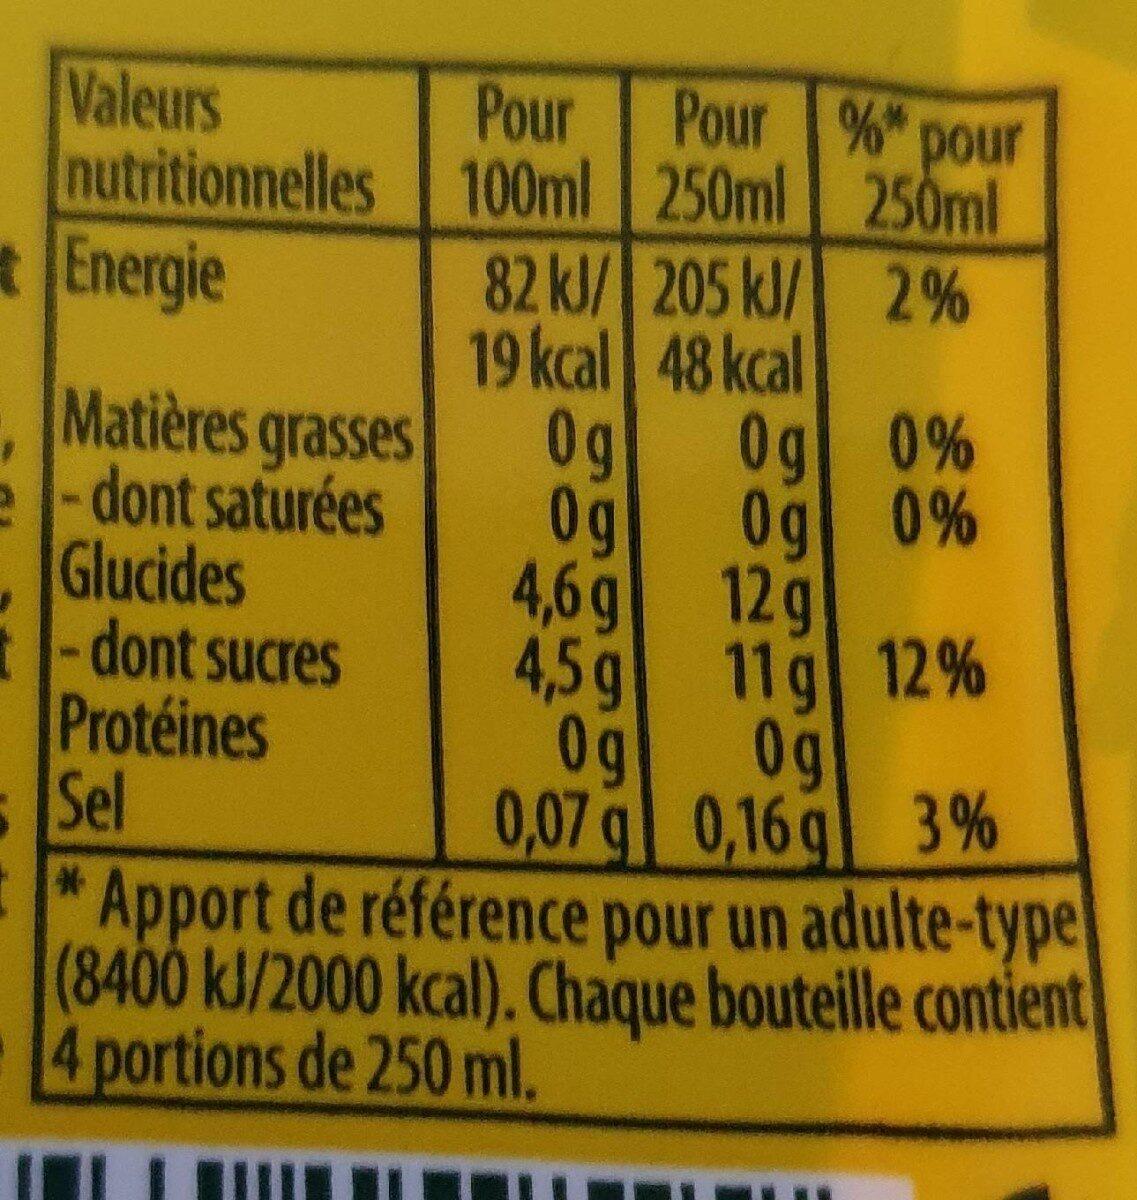 Lipton Ice Tea saveur mangue lot de 2 x 1 L - Valori nutrizionali - fr